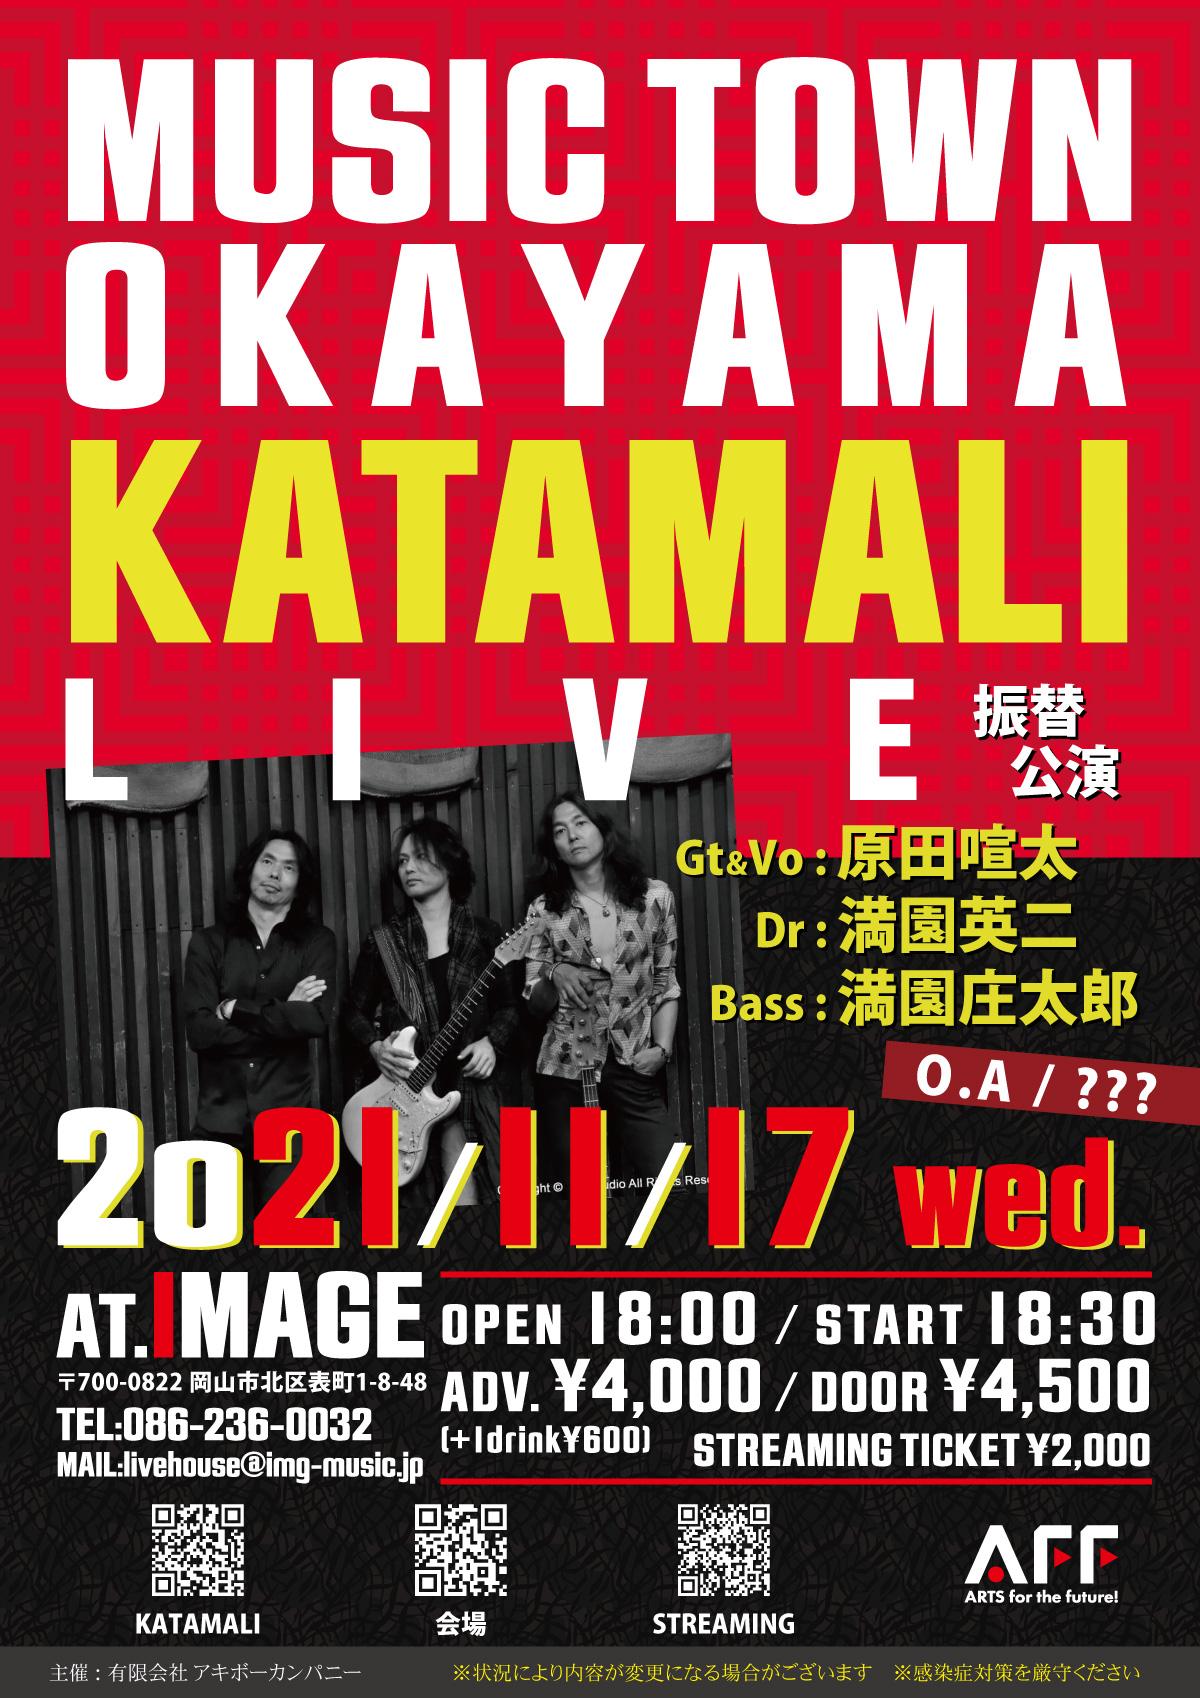 MUSIC TOWN OKAYAMA KATAMALI LIVE【振替公演】